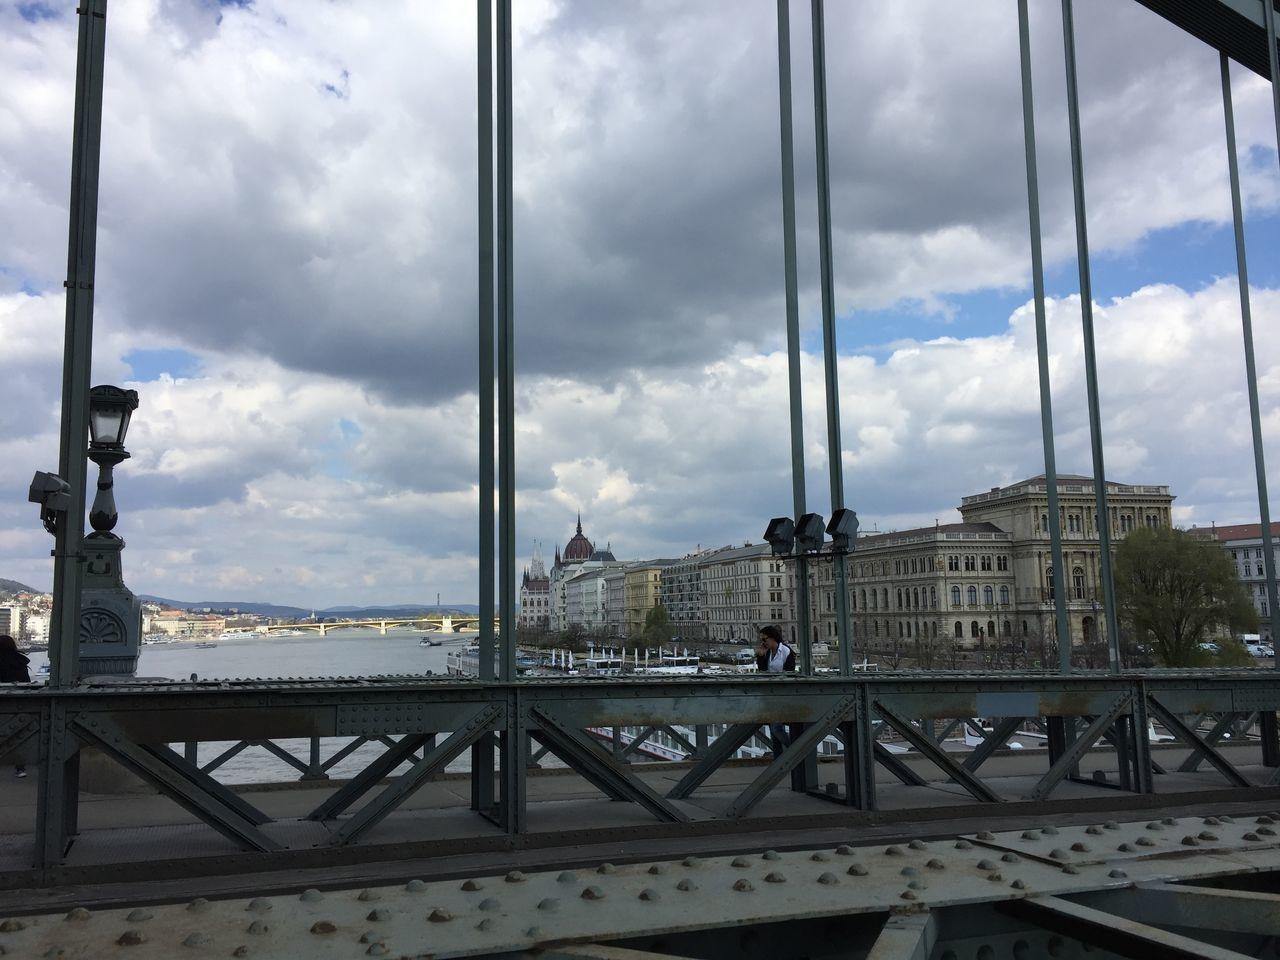 cloud - sky, sky, architecture, railing, built structure, bridge - man made structure, day, city, building exterior, travel destinations, indoors, cityscape, no people